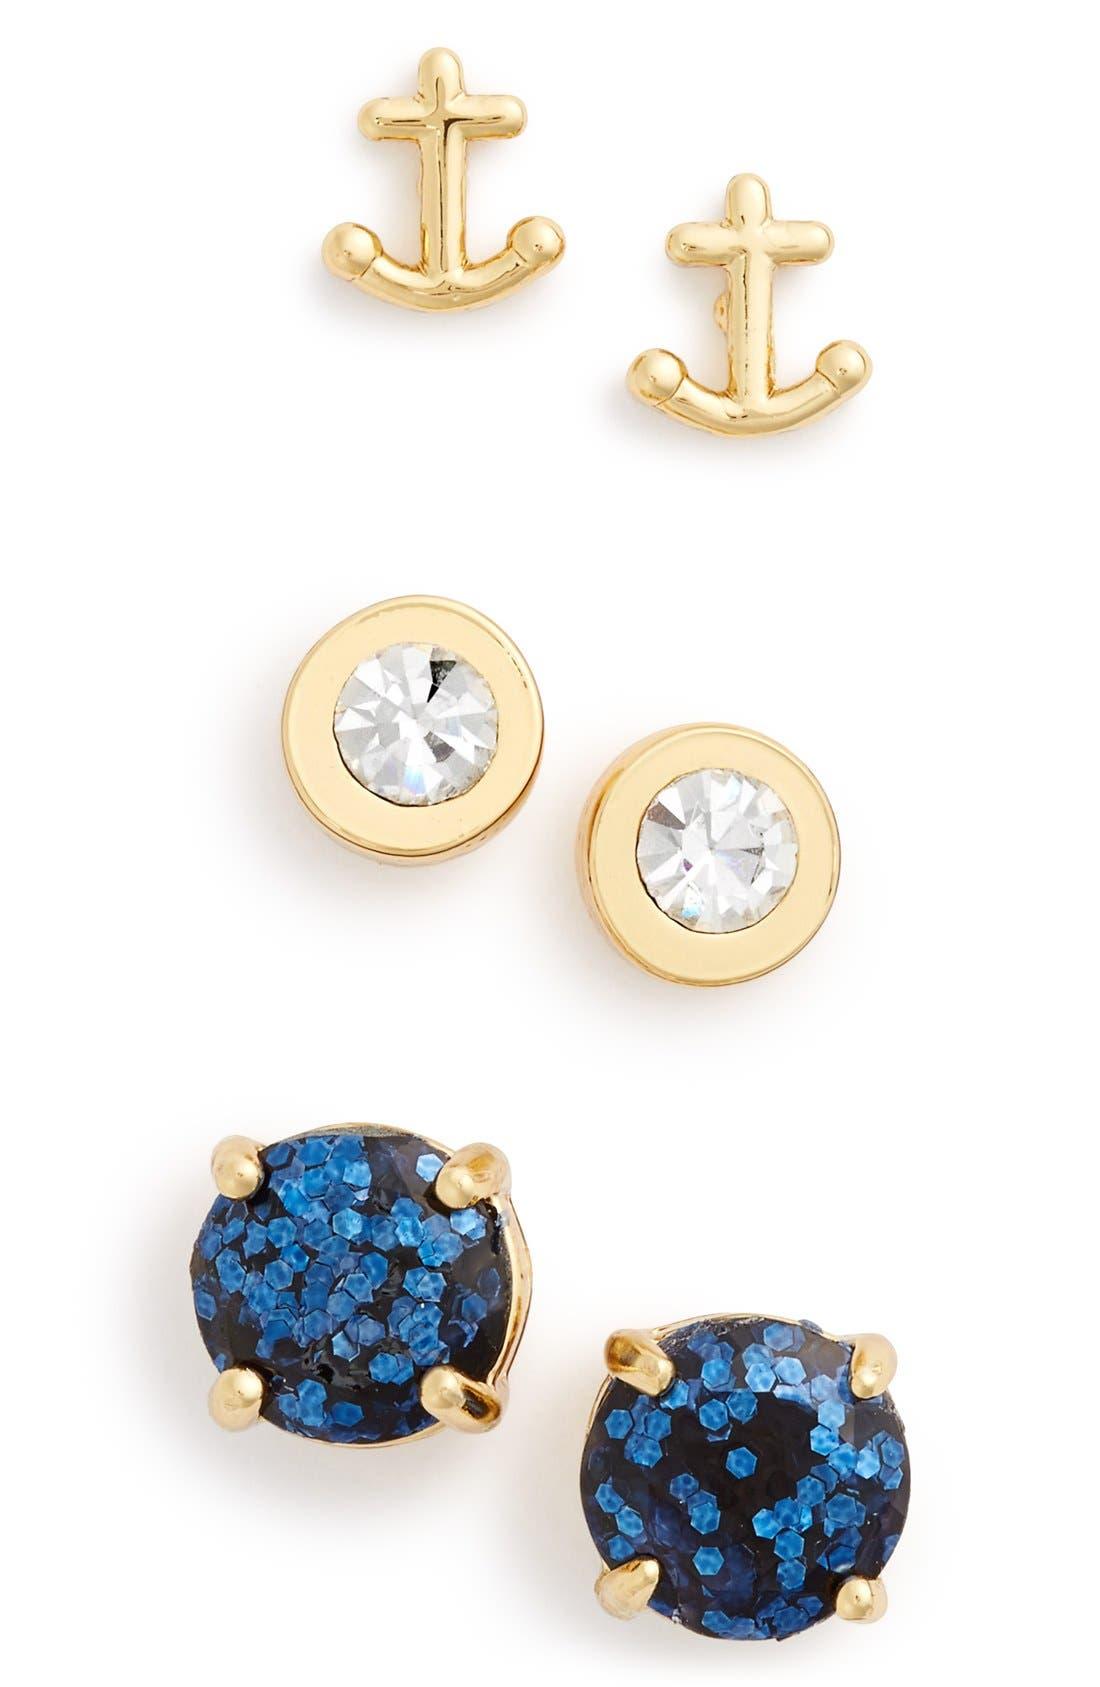 Main Image - kate spade new york 'navy glitter' anchor & round stud earrings (Set of 3)